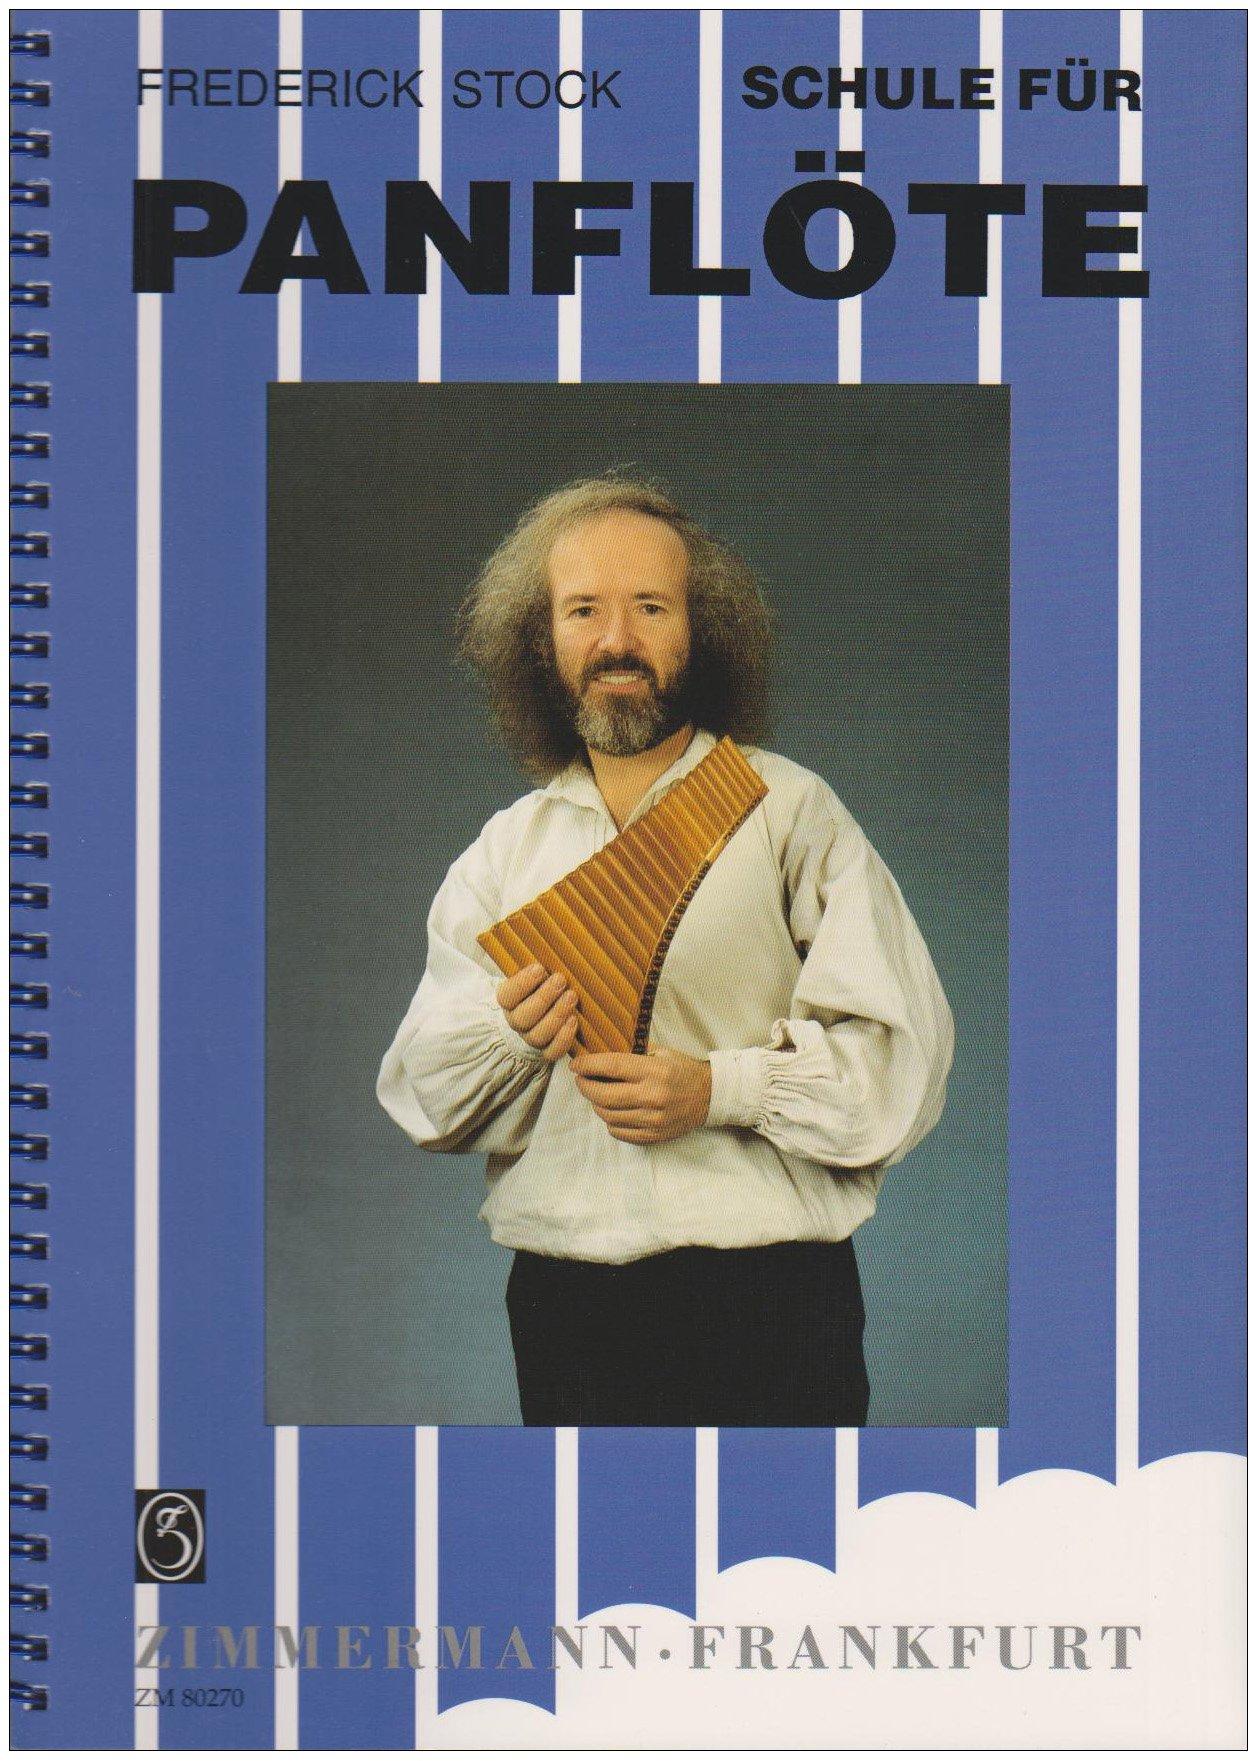 Schule für Panflöte: Panflöte. Lehrbuch.